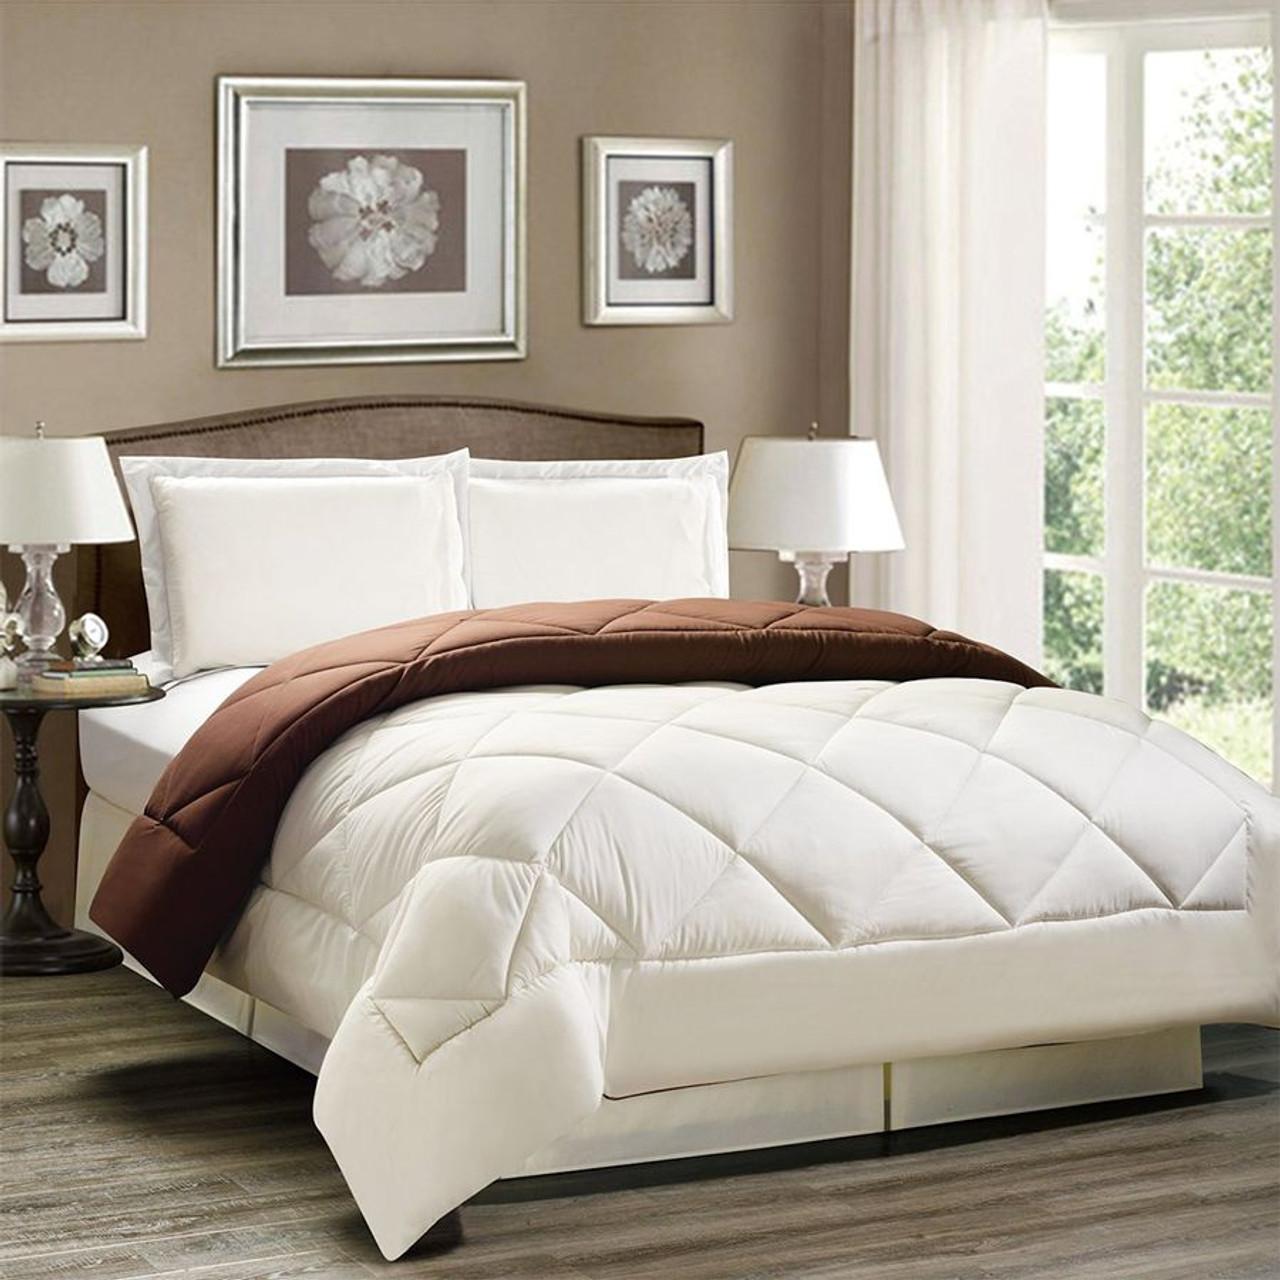 3pc Down Alternative Reversible Comforter Set in Brown